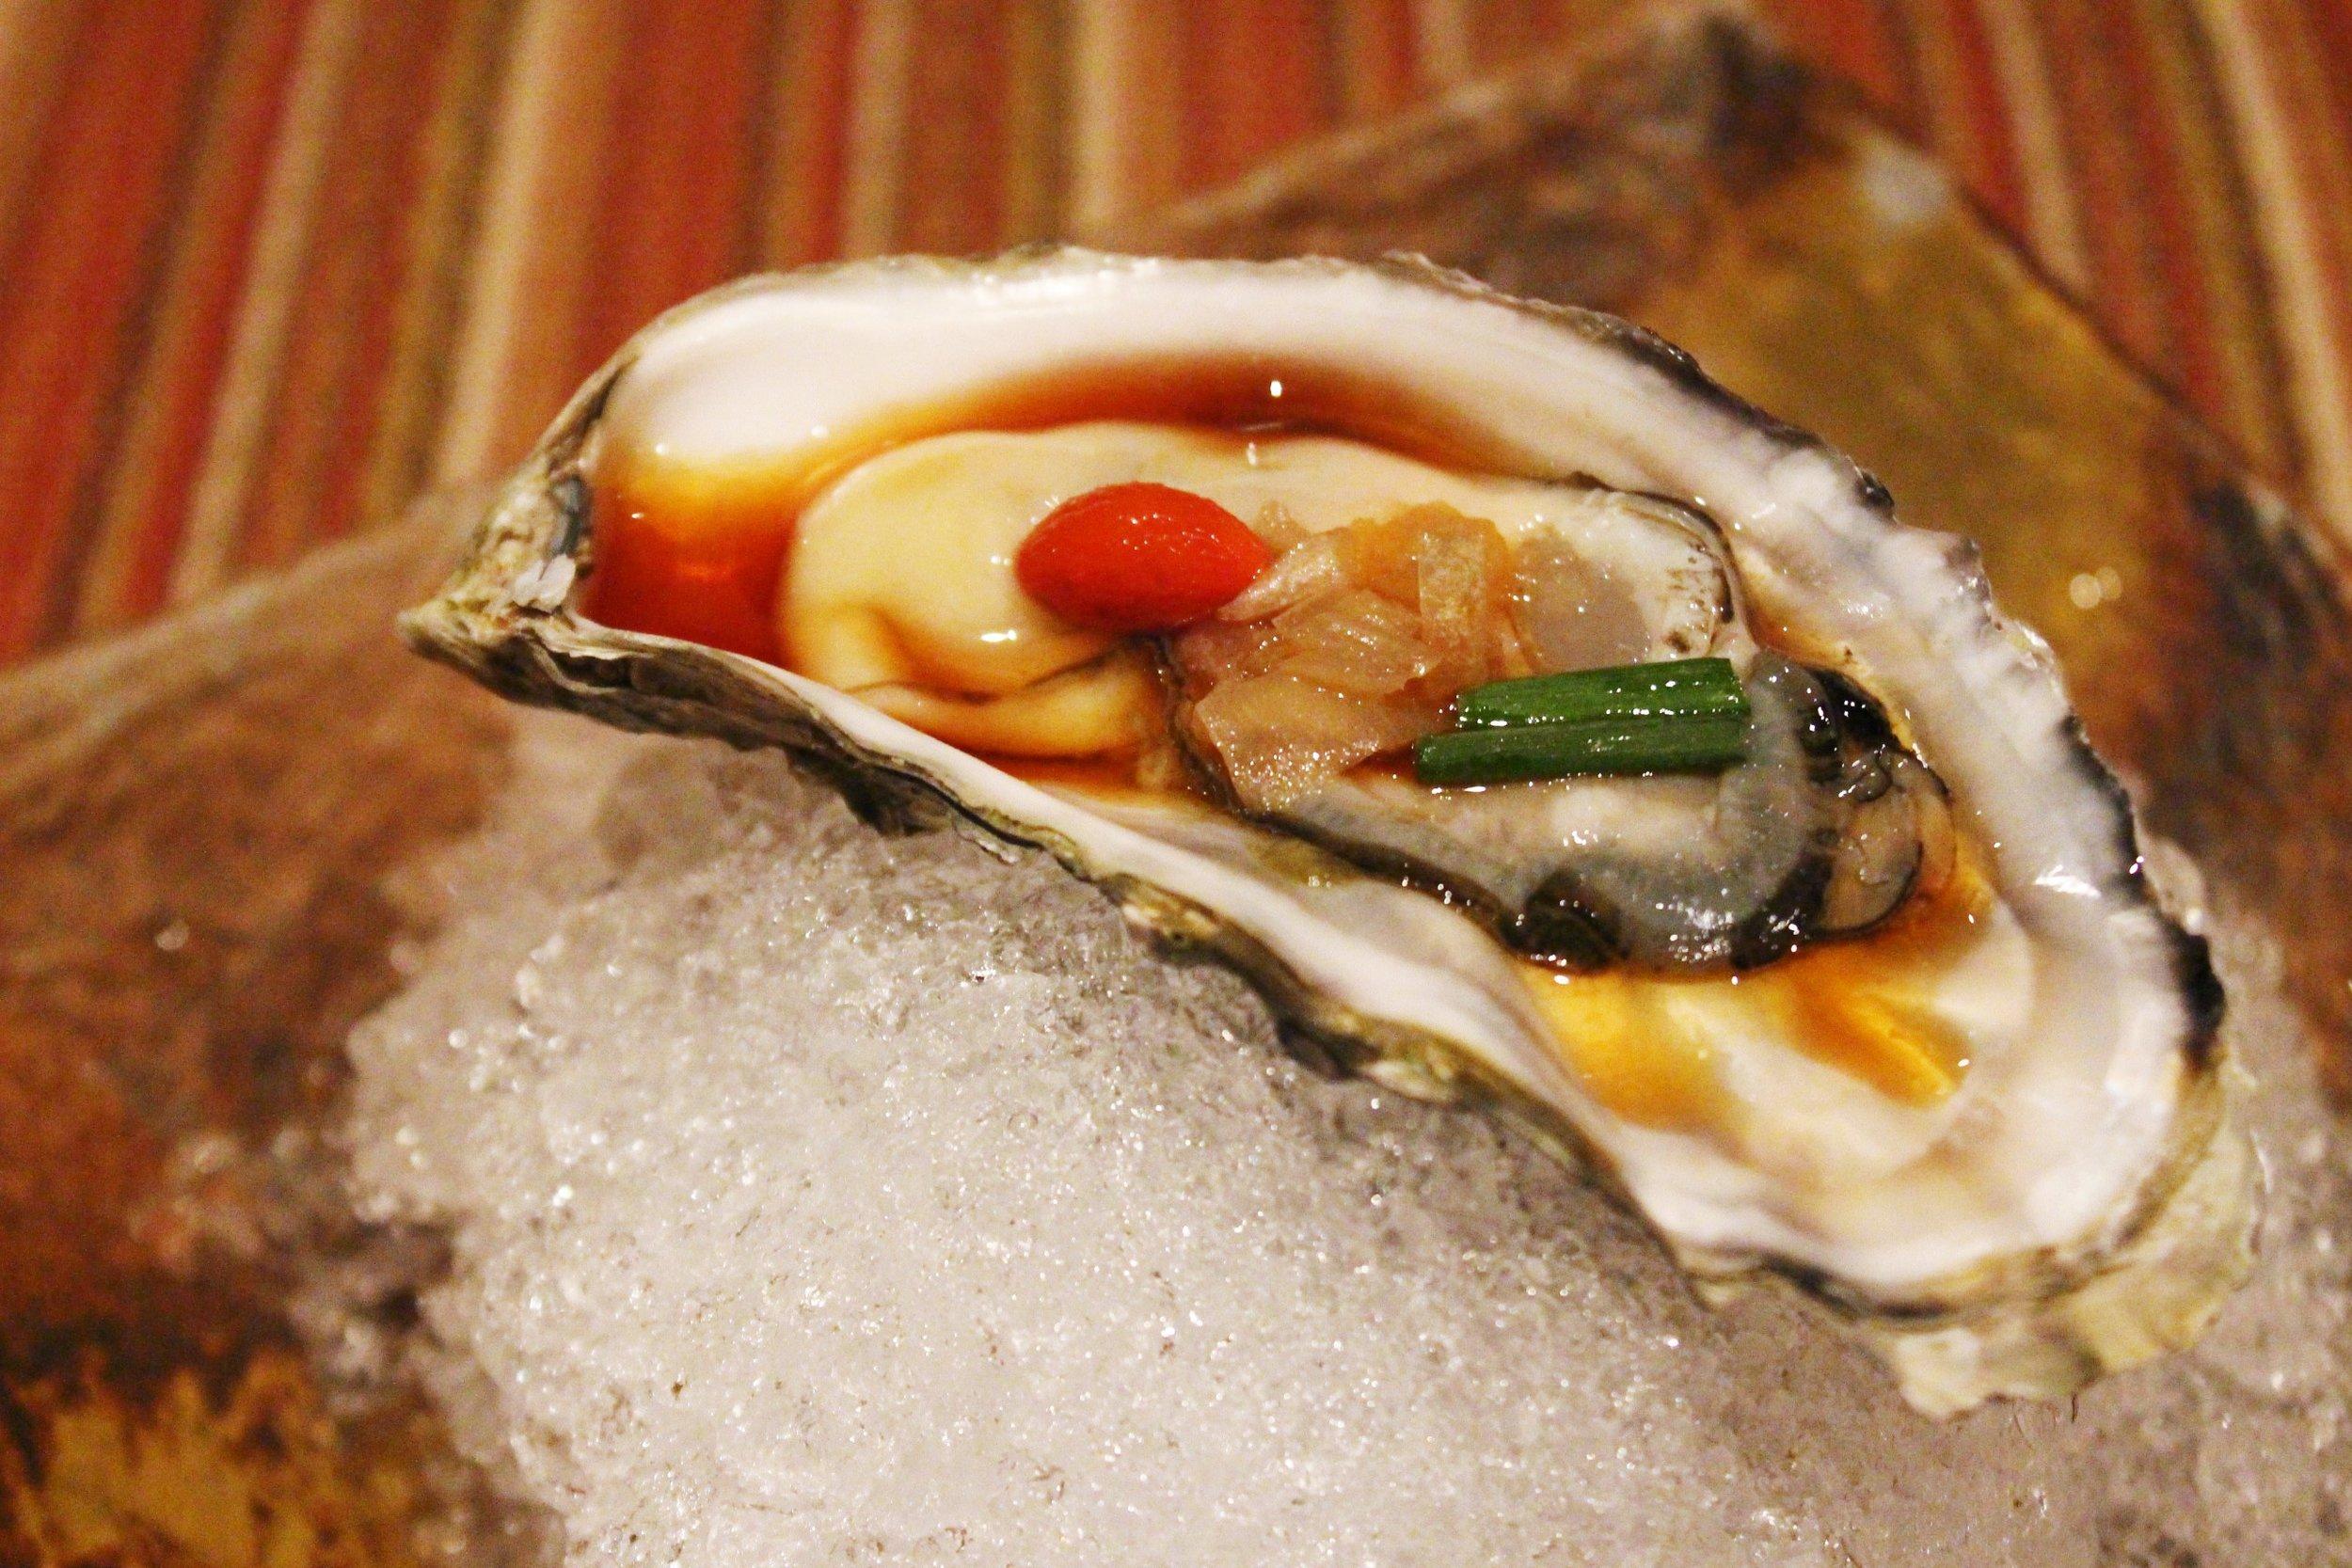 Fresh North Bay Oysters with Onion, Ponzu Sauce, and Goji Berry at Kyo Ya